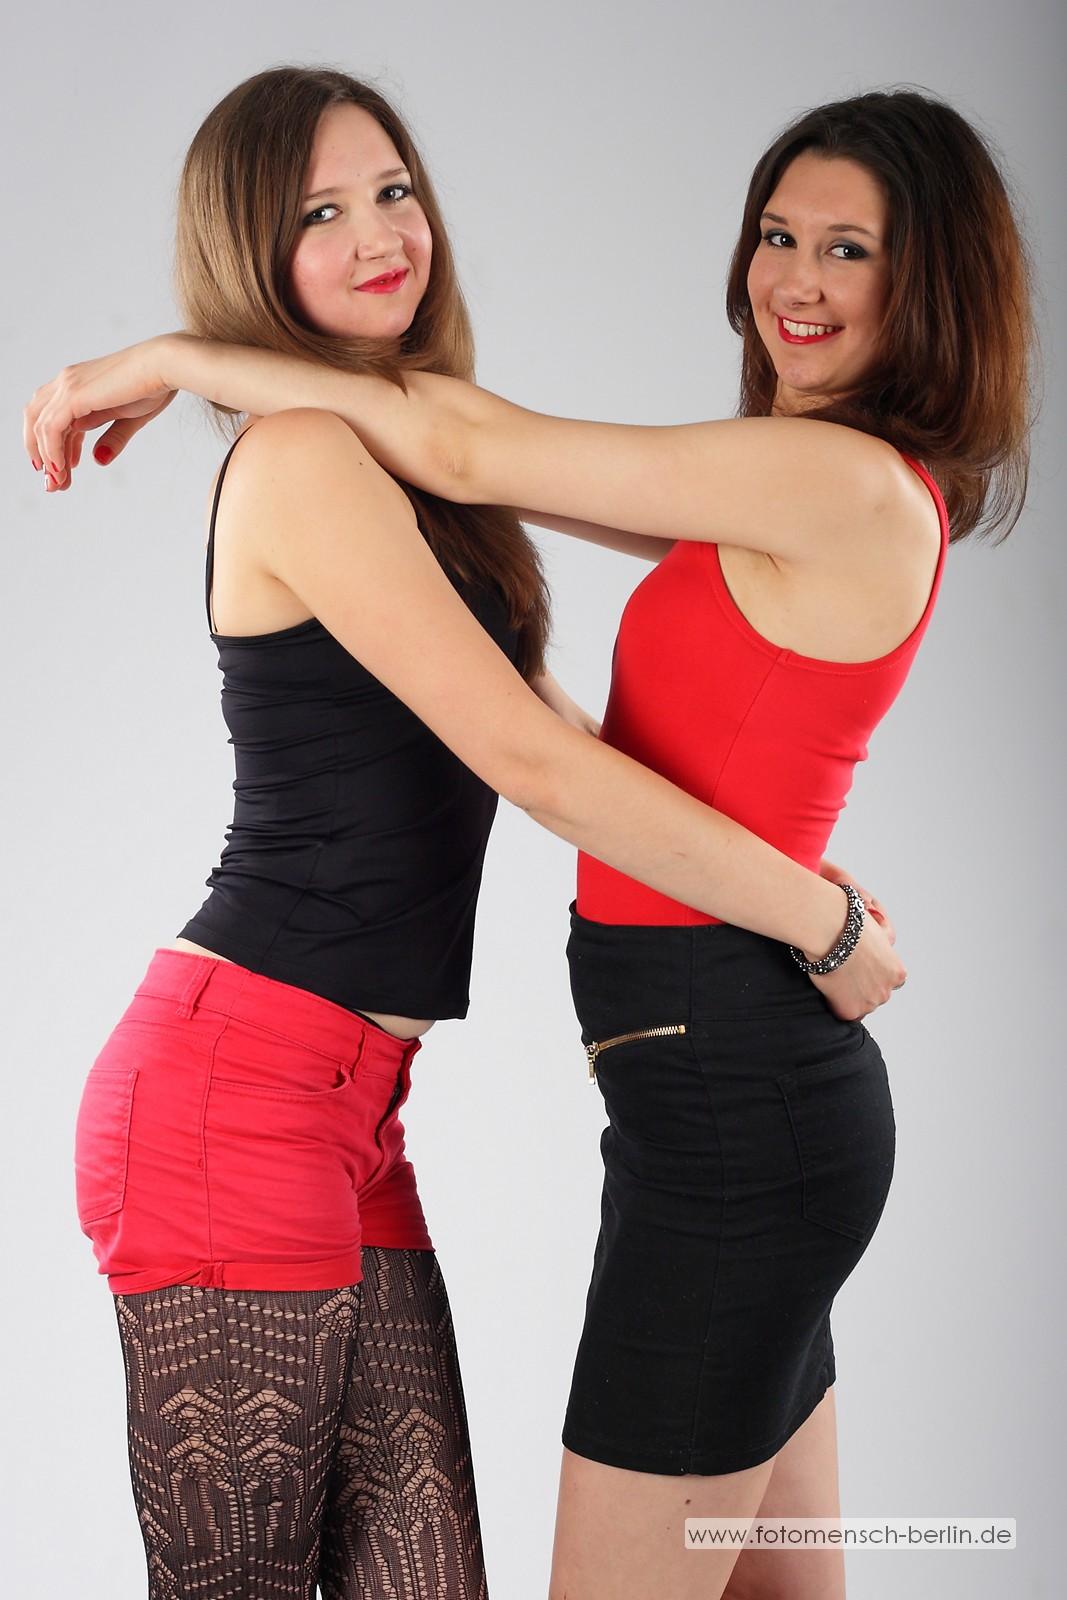 Geschwister-Shooting: Julia und Lisa